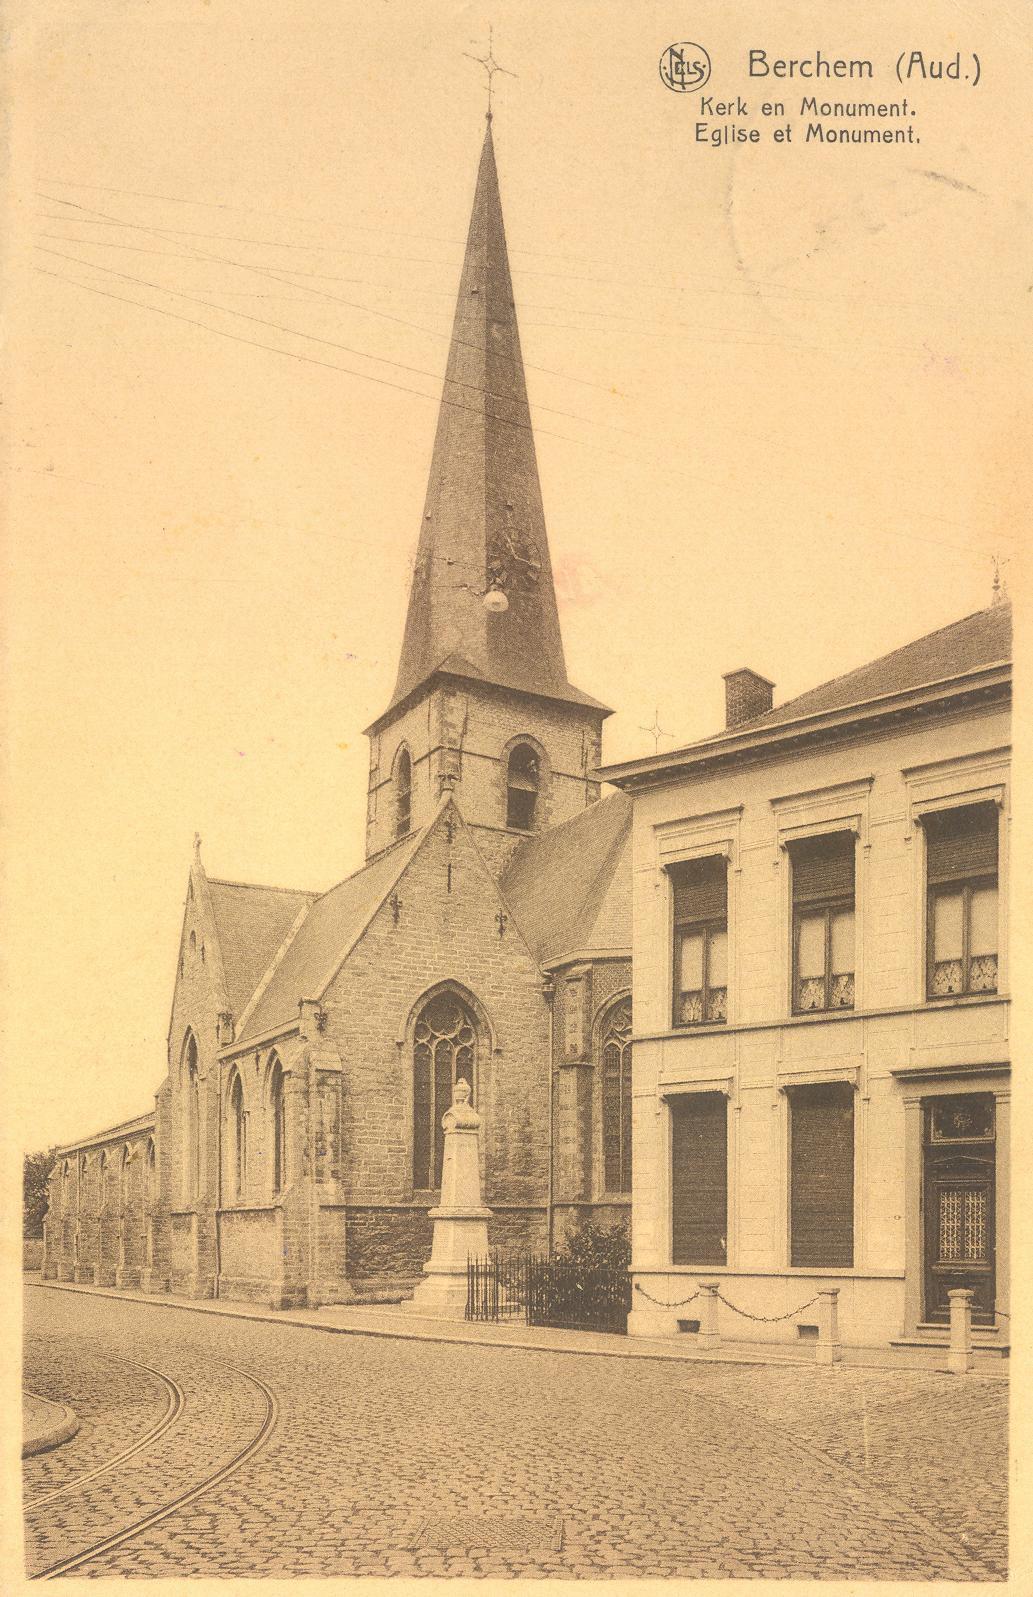 EK 112 Berchem  kerk monument 1914-18.JPG